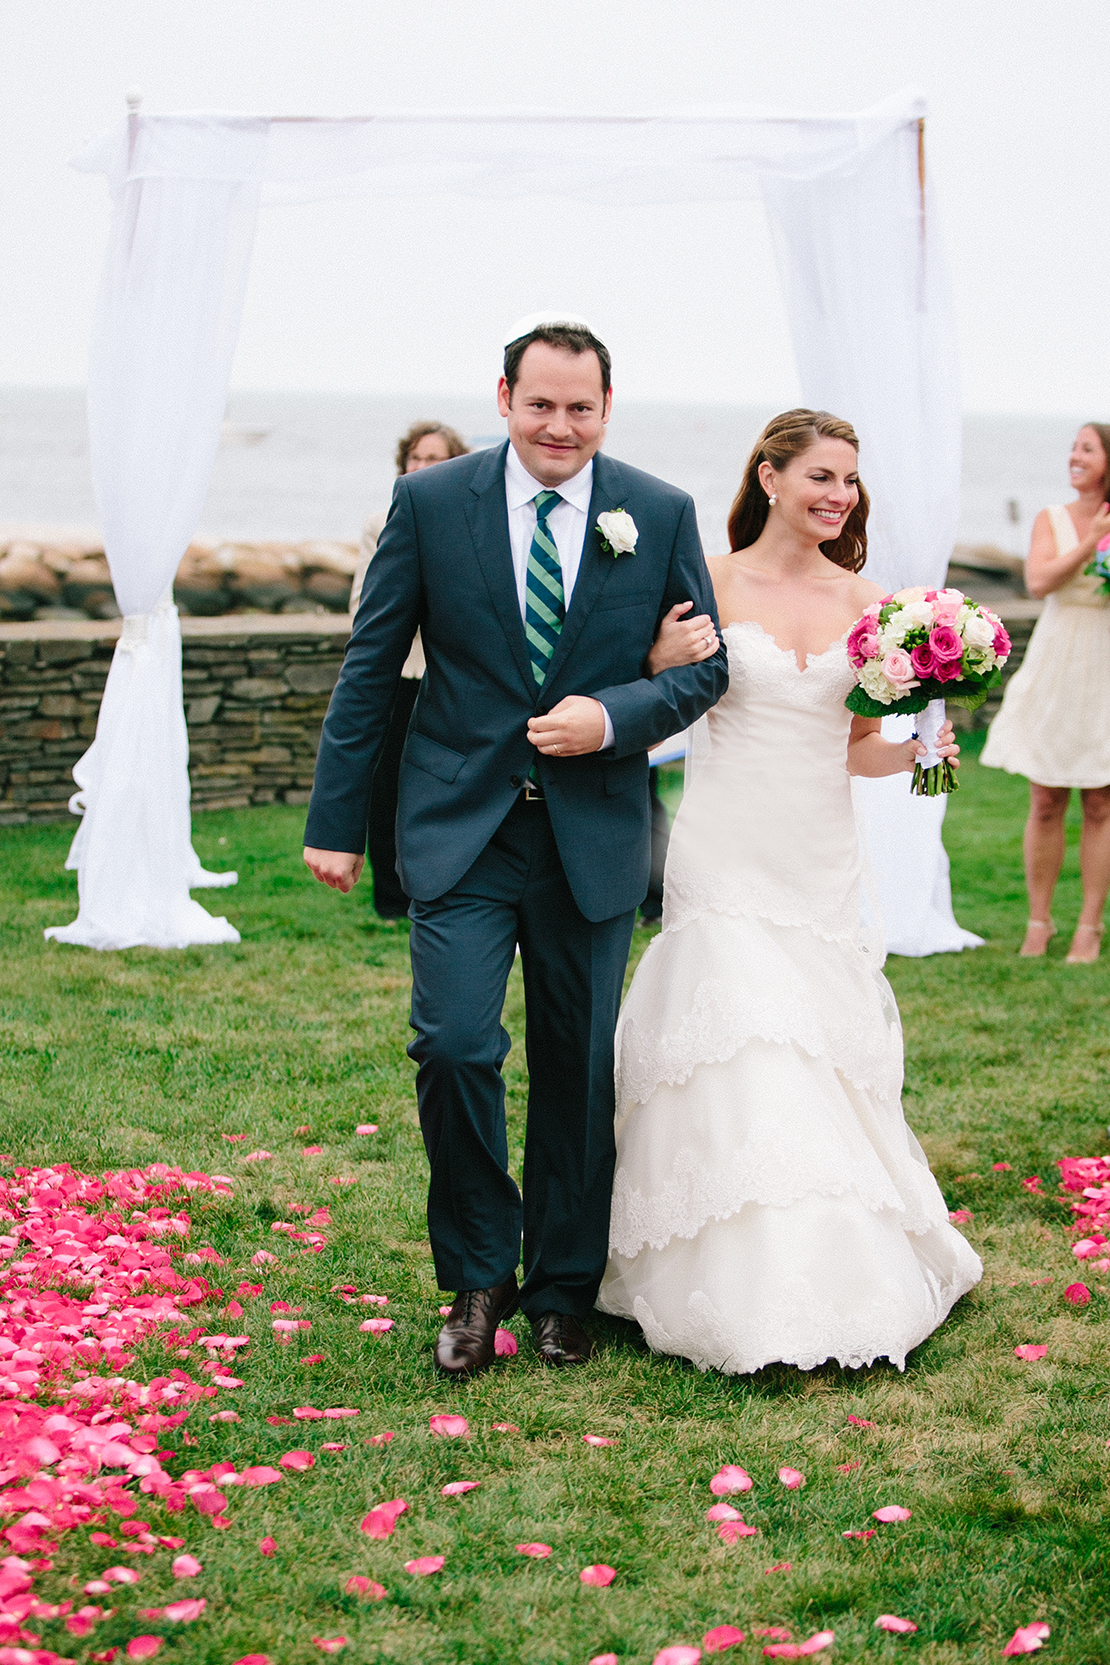 32_wychmere_beach_club_lawn_wedding_ceremony_cape_cod_photography